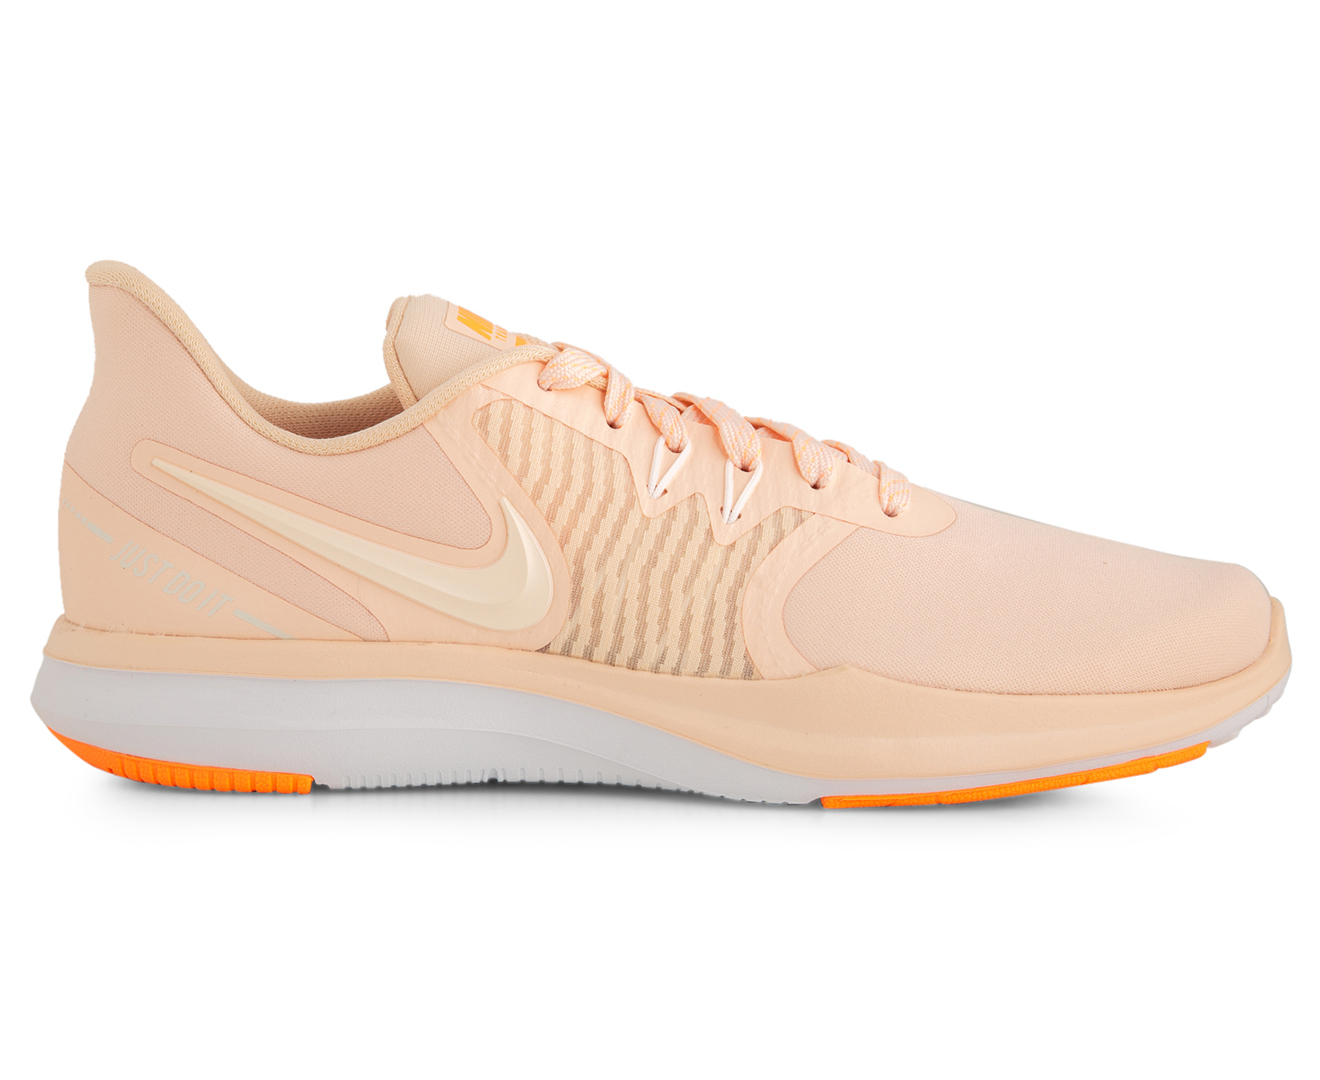 Nike Women's In Season TR 8 Shoe Guava IceSail Orange Pulse